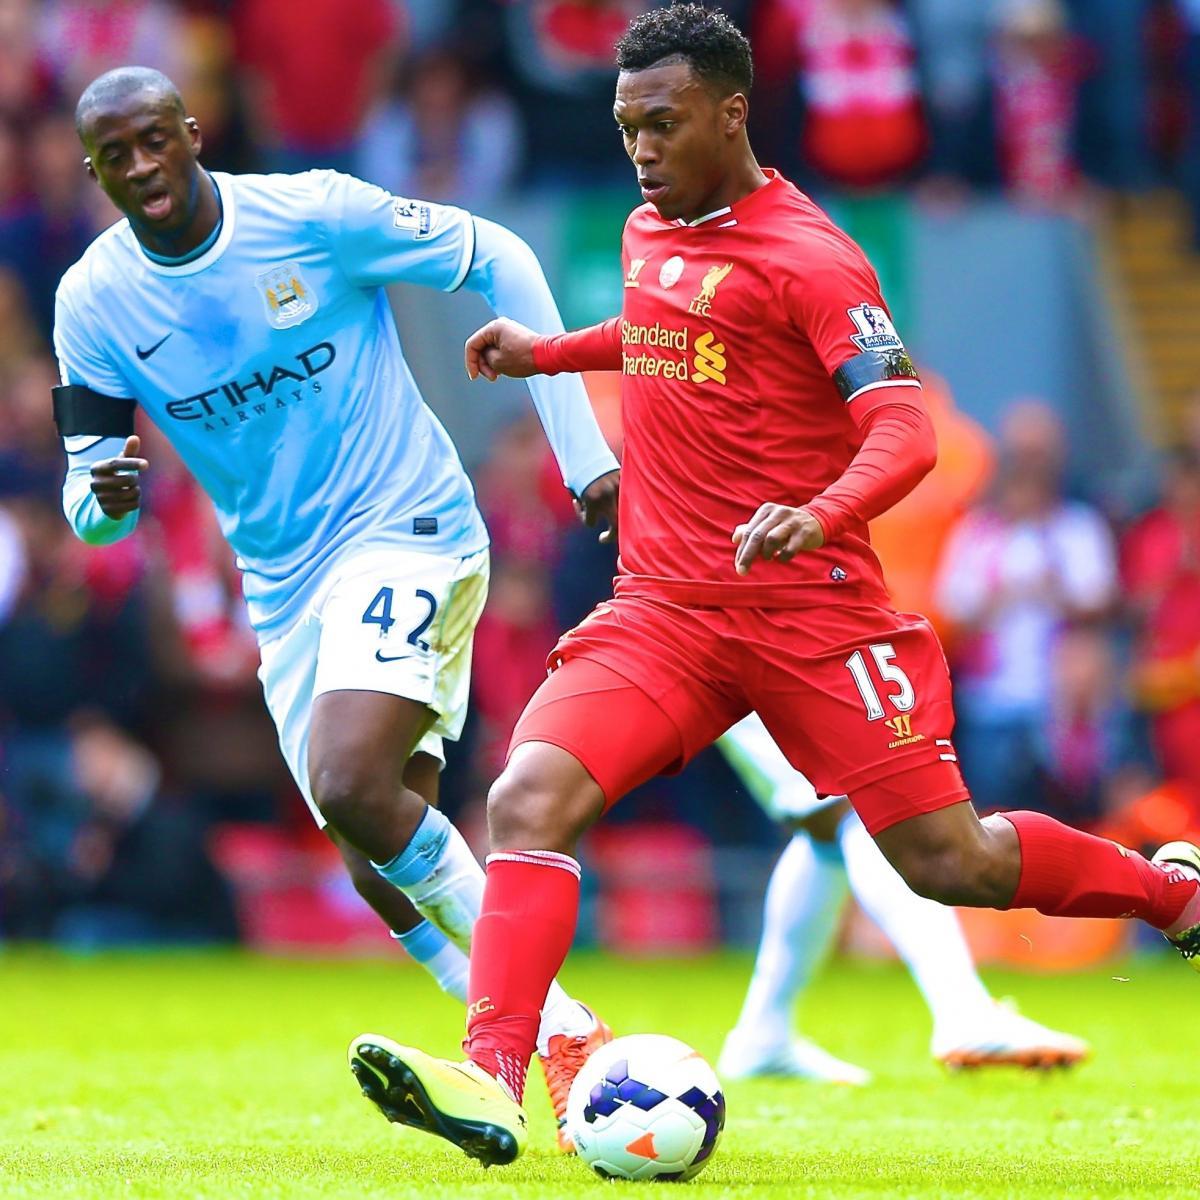 Psg Vs Manchester City Live Score Highlights From: Liverpool Vs. Manchester City: Premier League Live Score